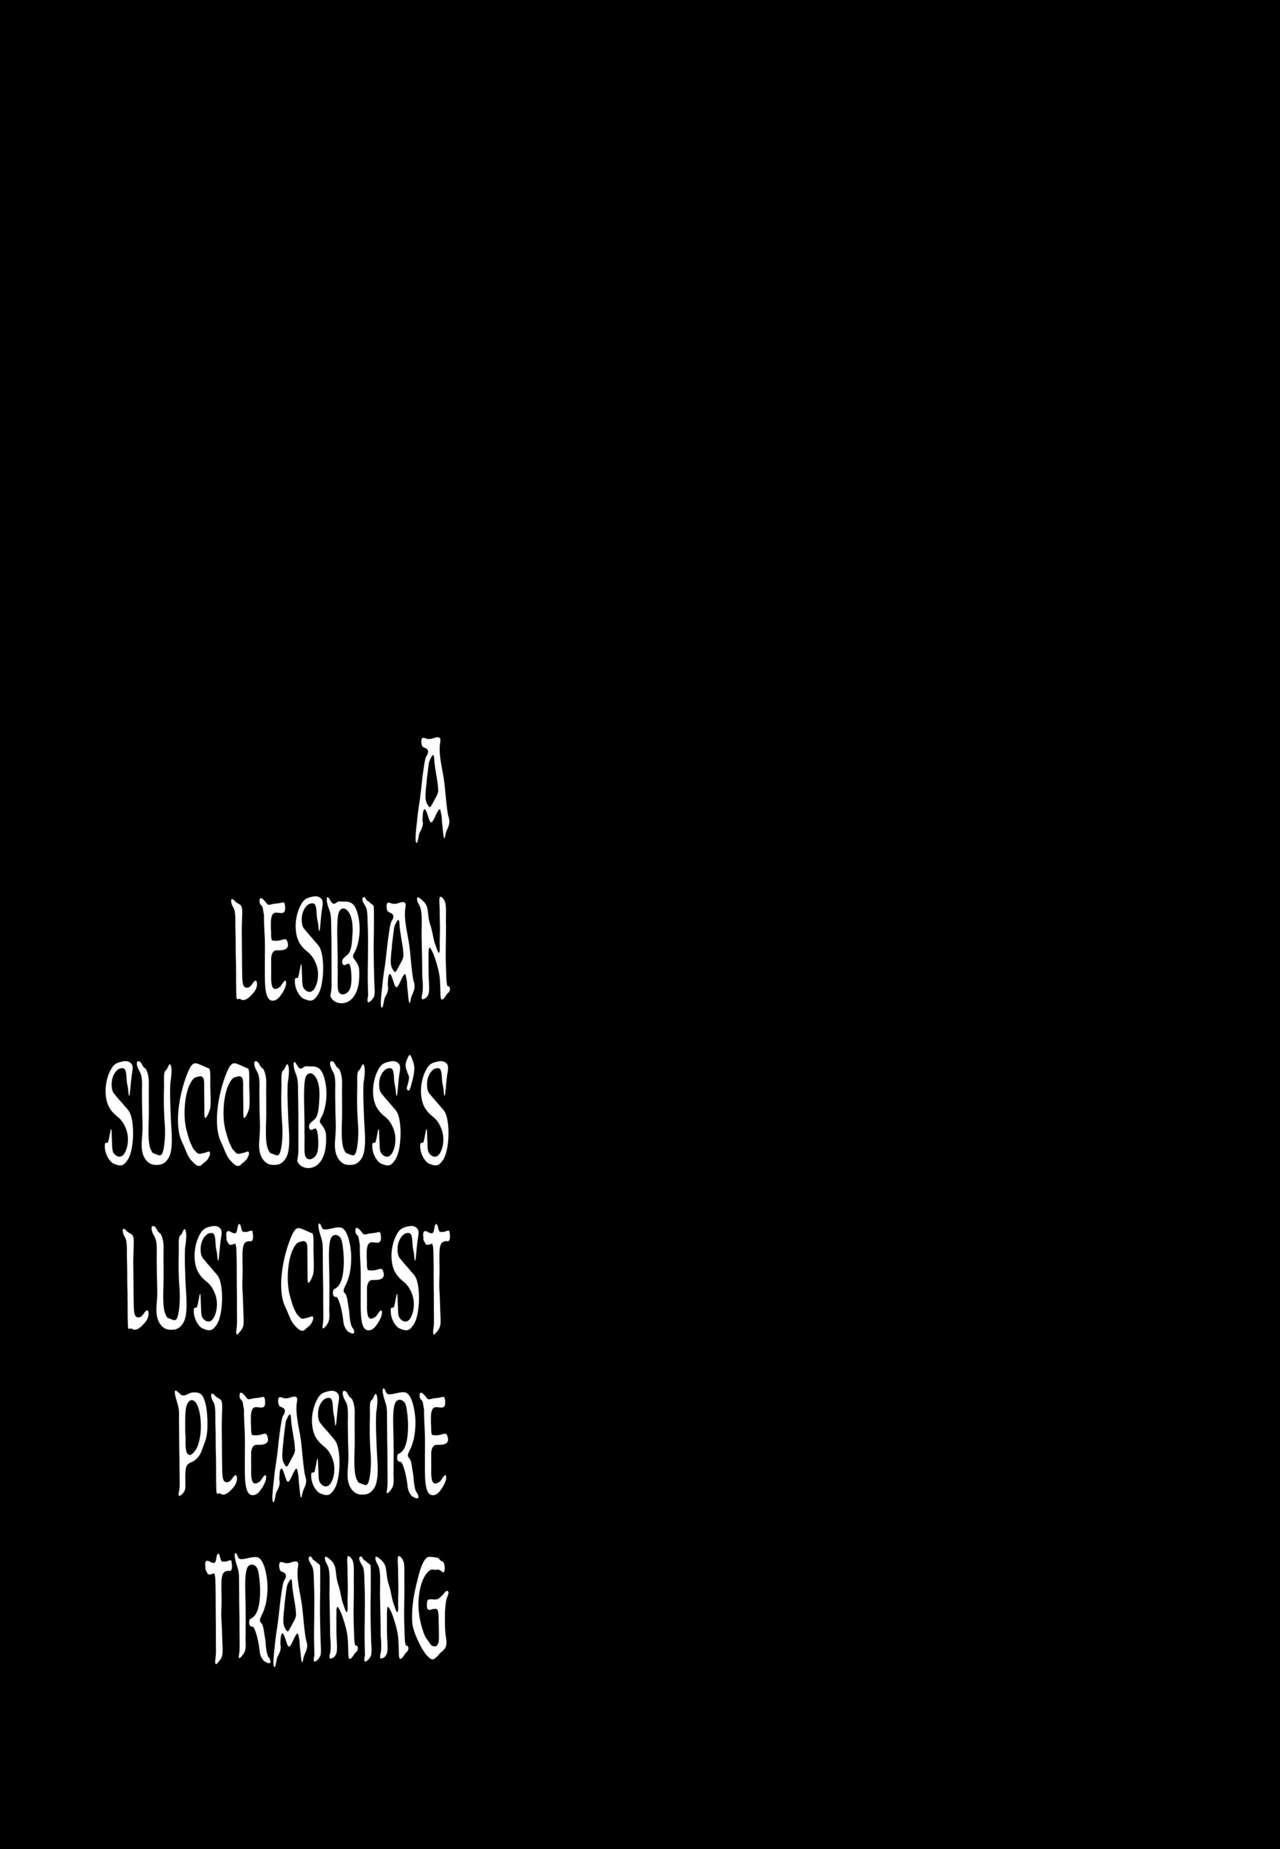 Les Inma no Inmon Kairaku Choukyou | A Lesbian Succubus's Lust Crest Pleasure Training 21